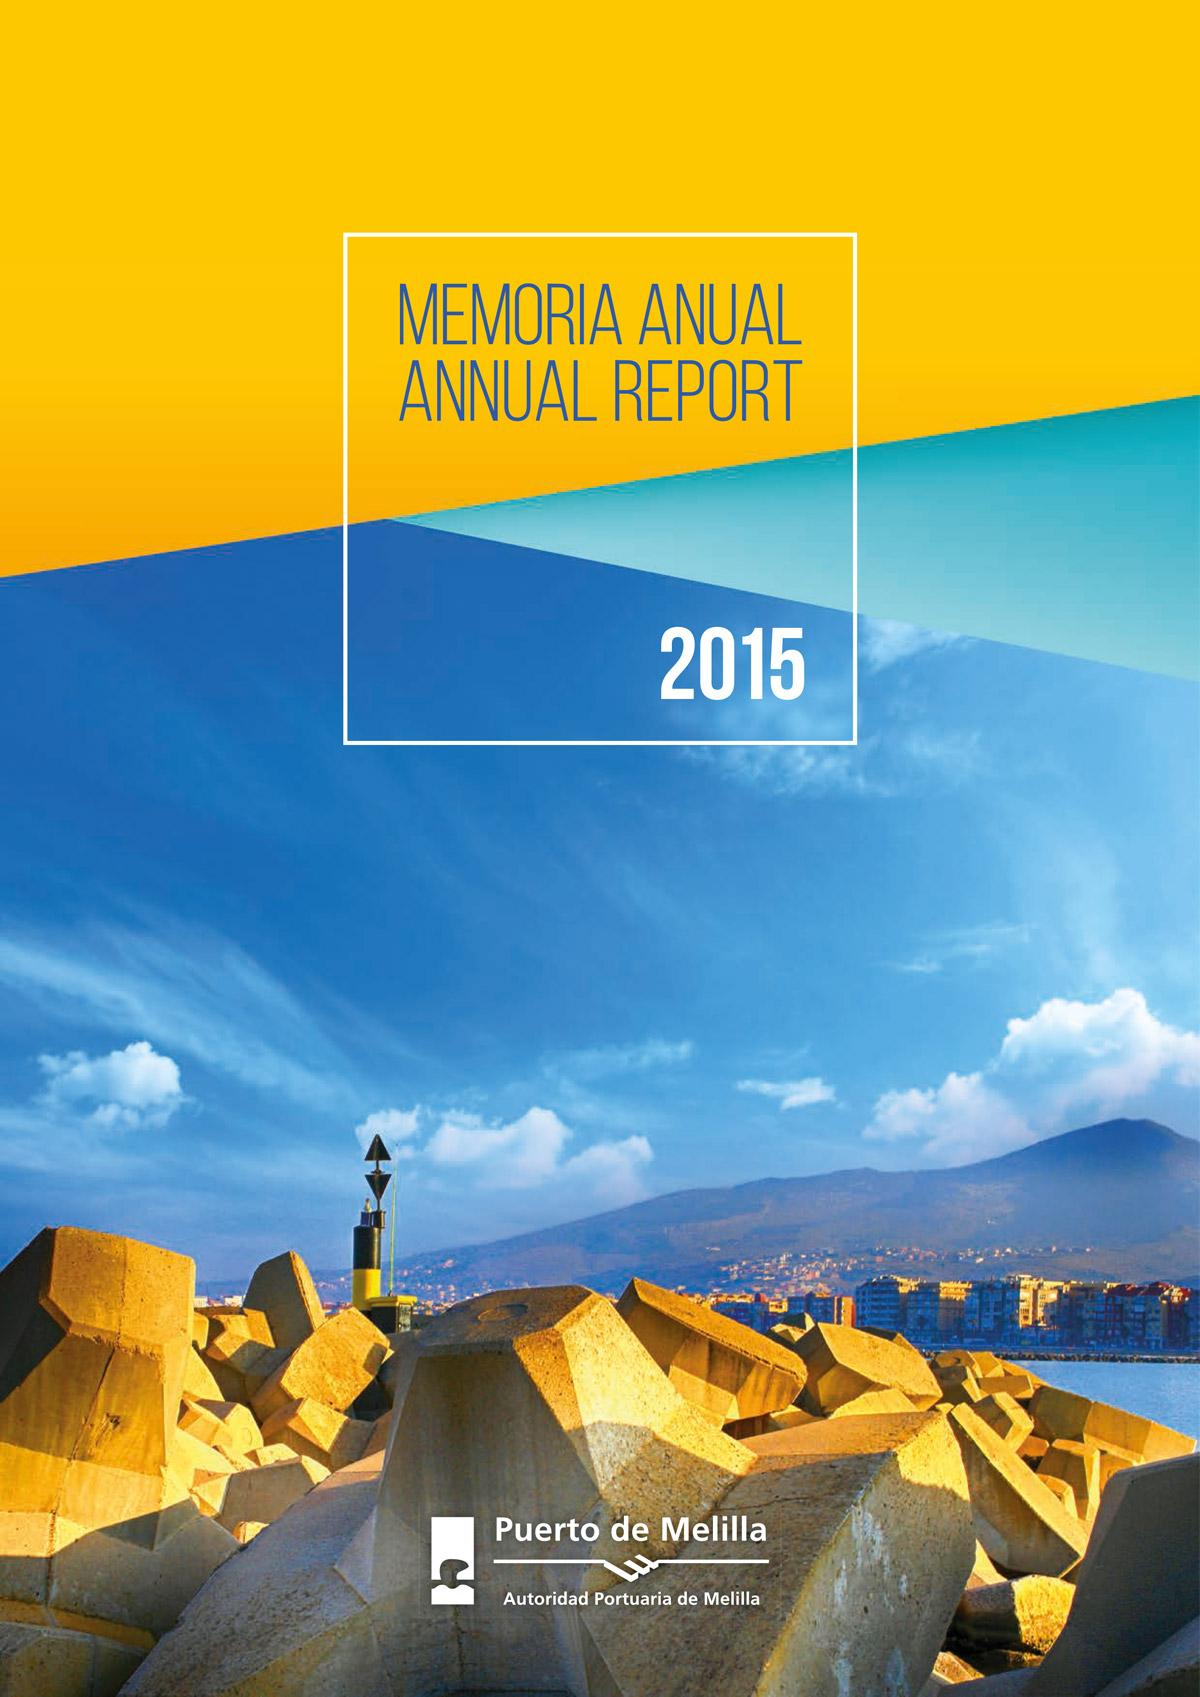 Diseño de memoria anual